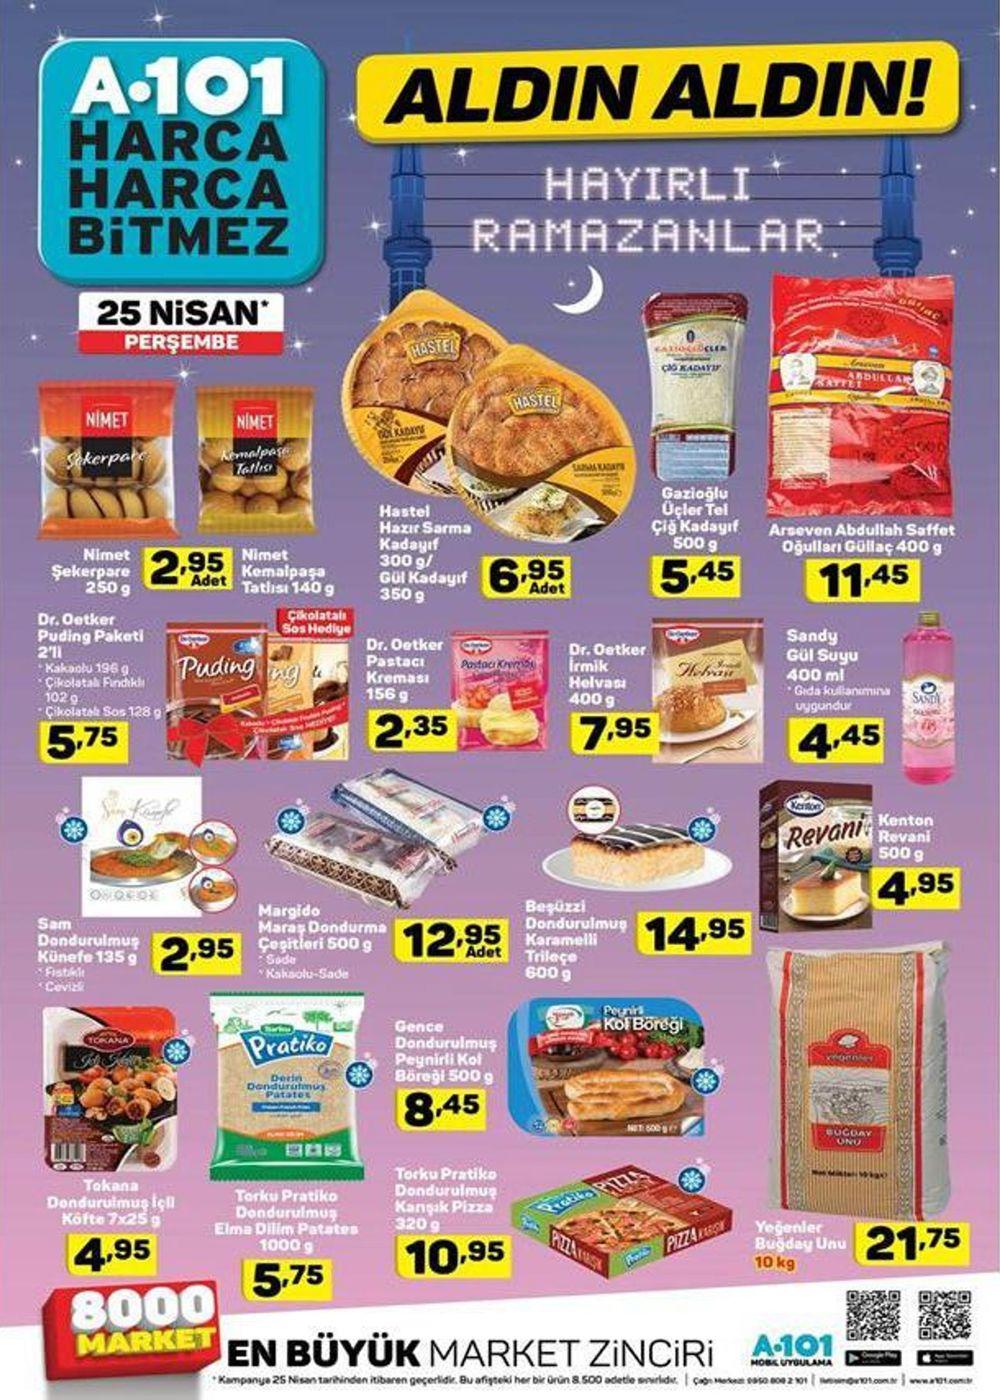 25 nisan a101 ramazan ayi indirimleri